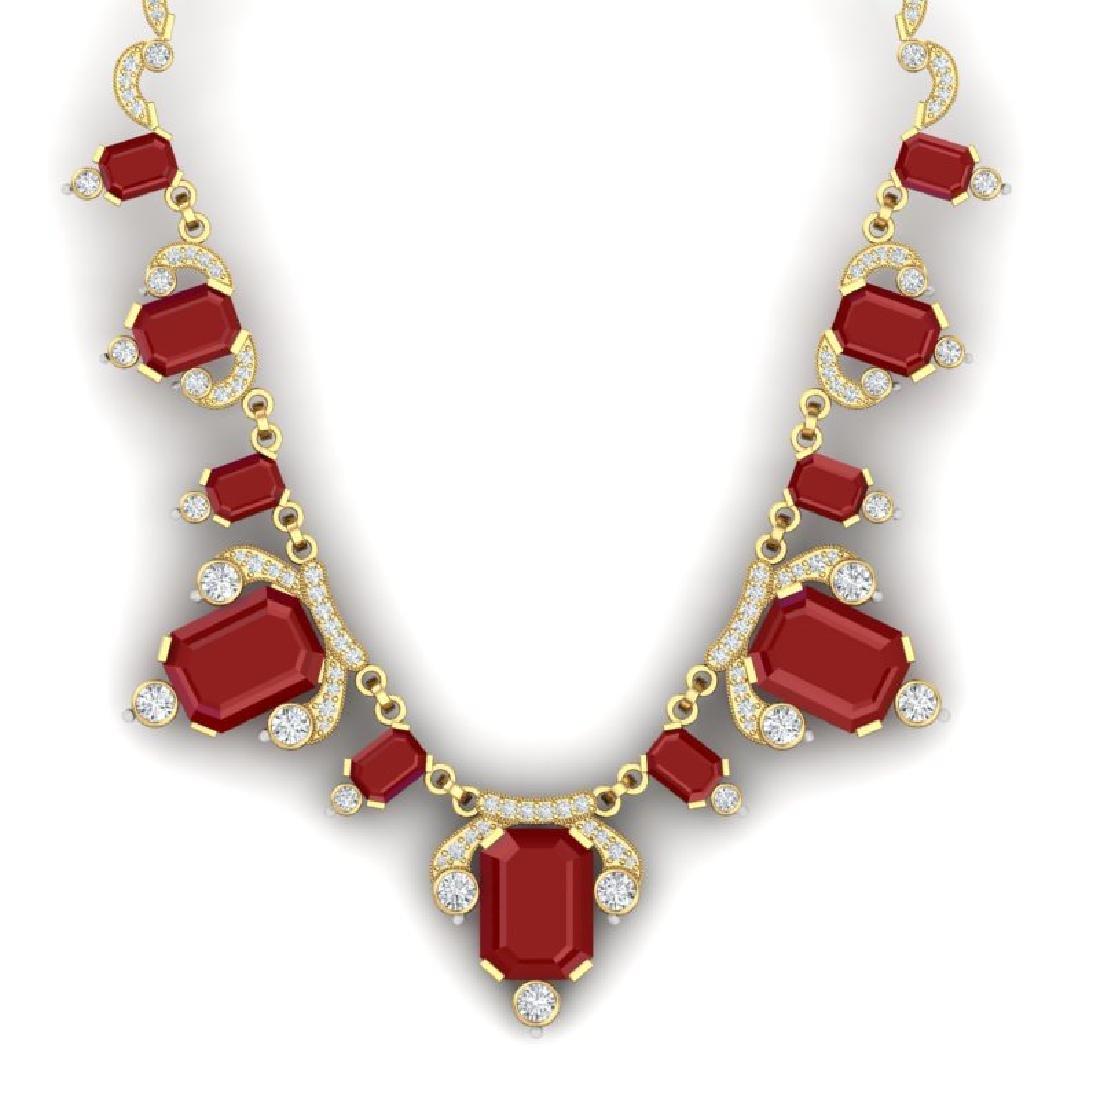 75.21 CTW Royalty Ruby & VS Diamond Necklace 18K Yellow